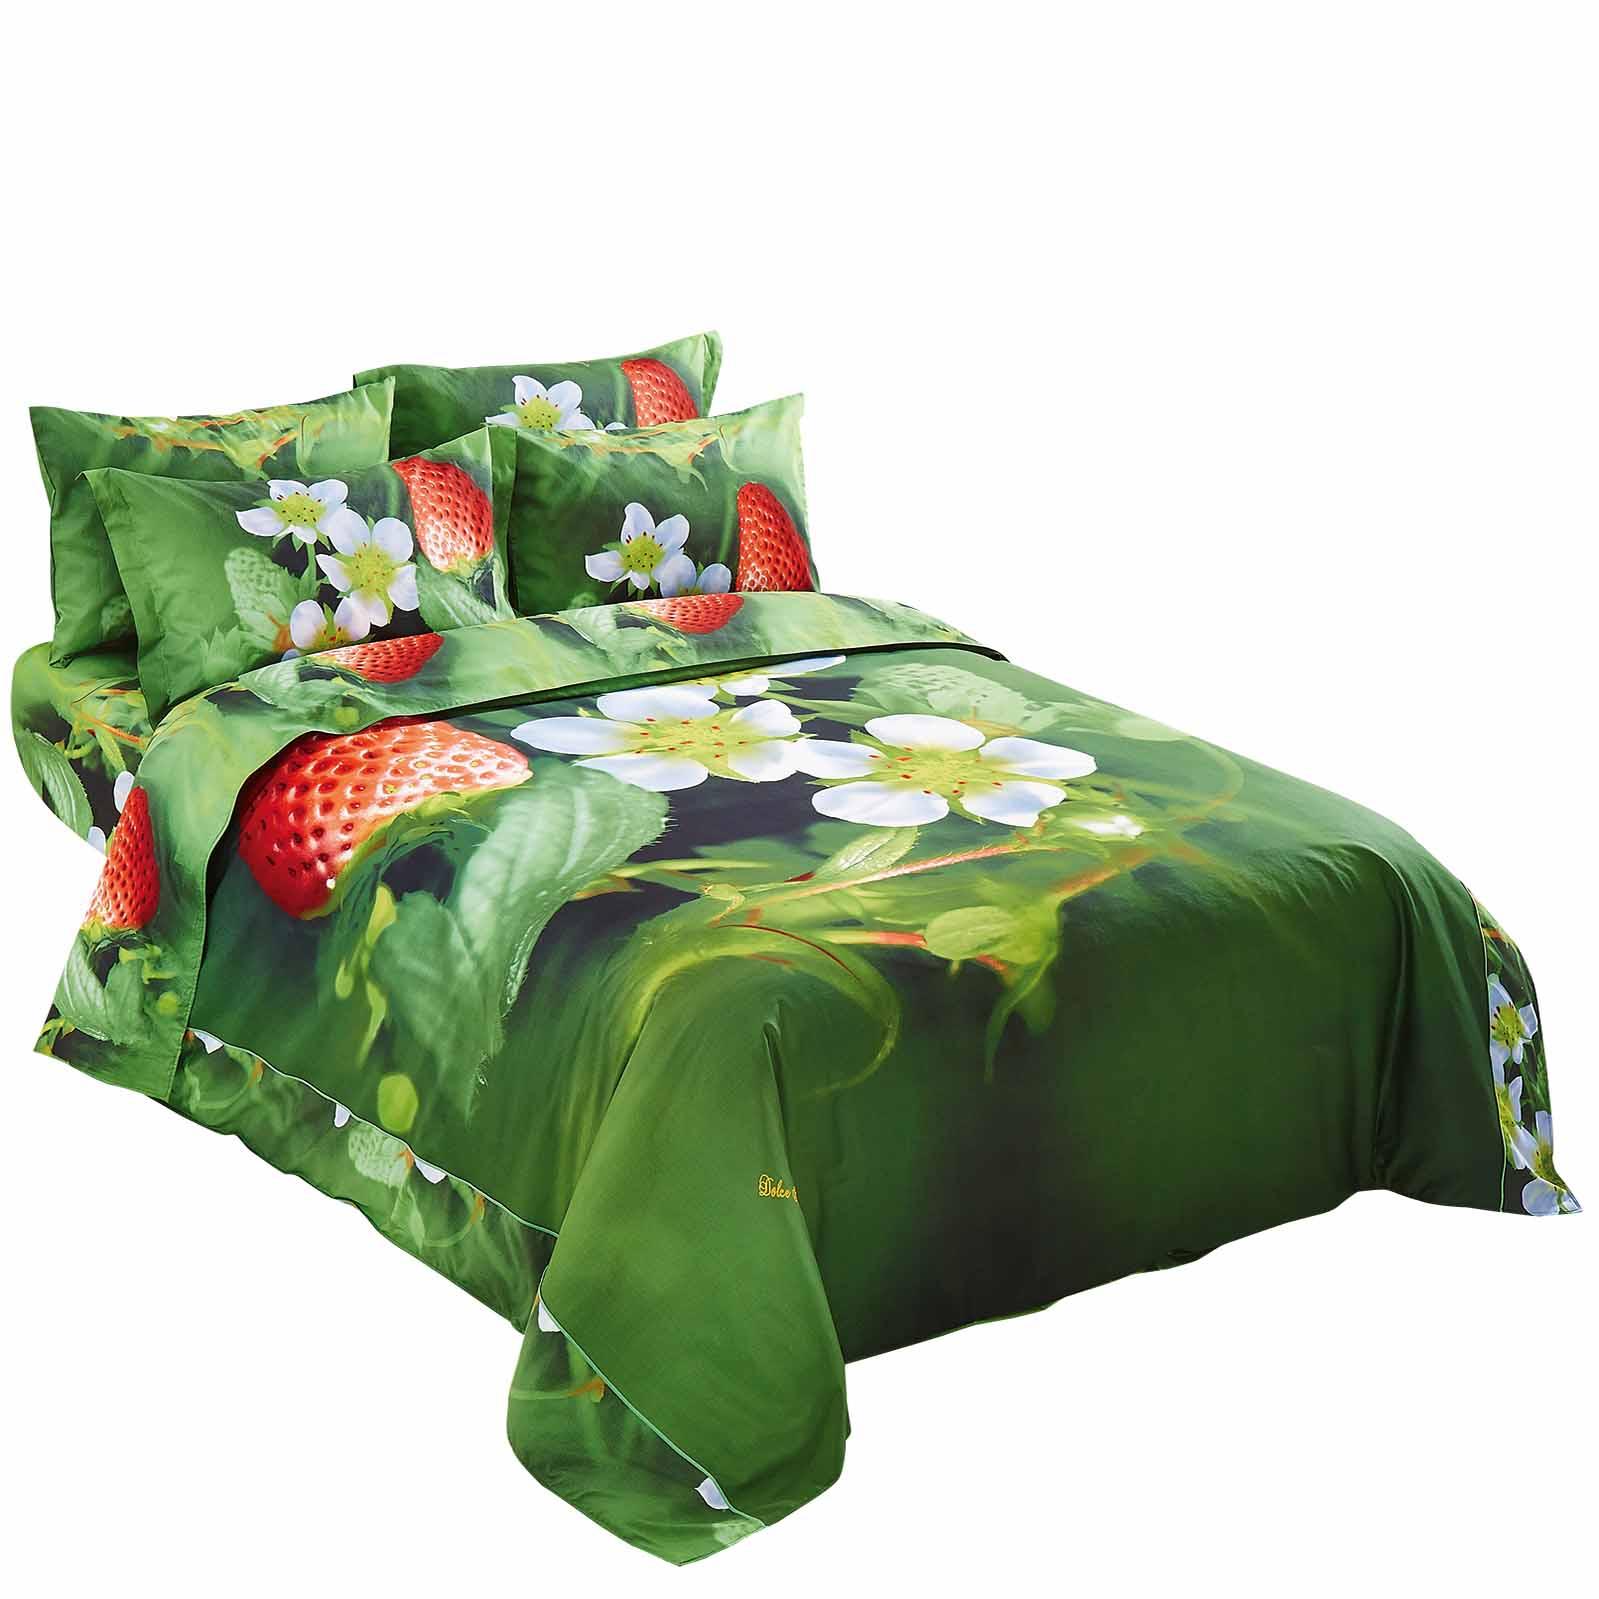 Dolce Mela - Strawberry Queen Size 6 Piece Duvet Cover Sheet Set Nature Themed Luxury Bedding DM512Q